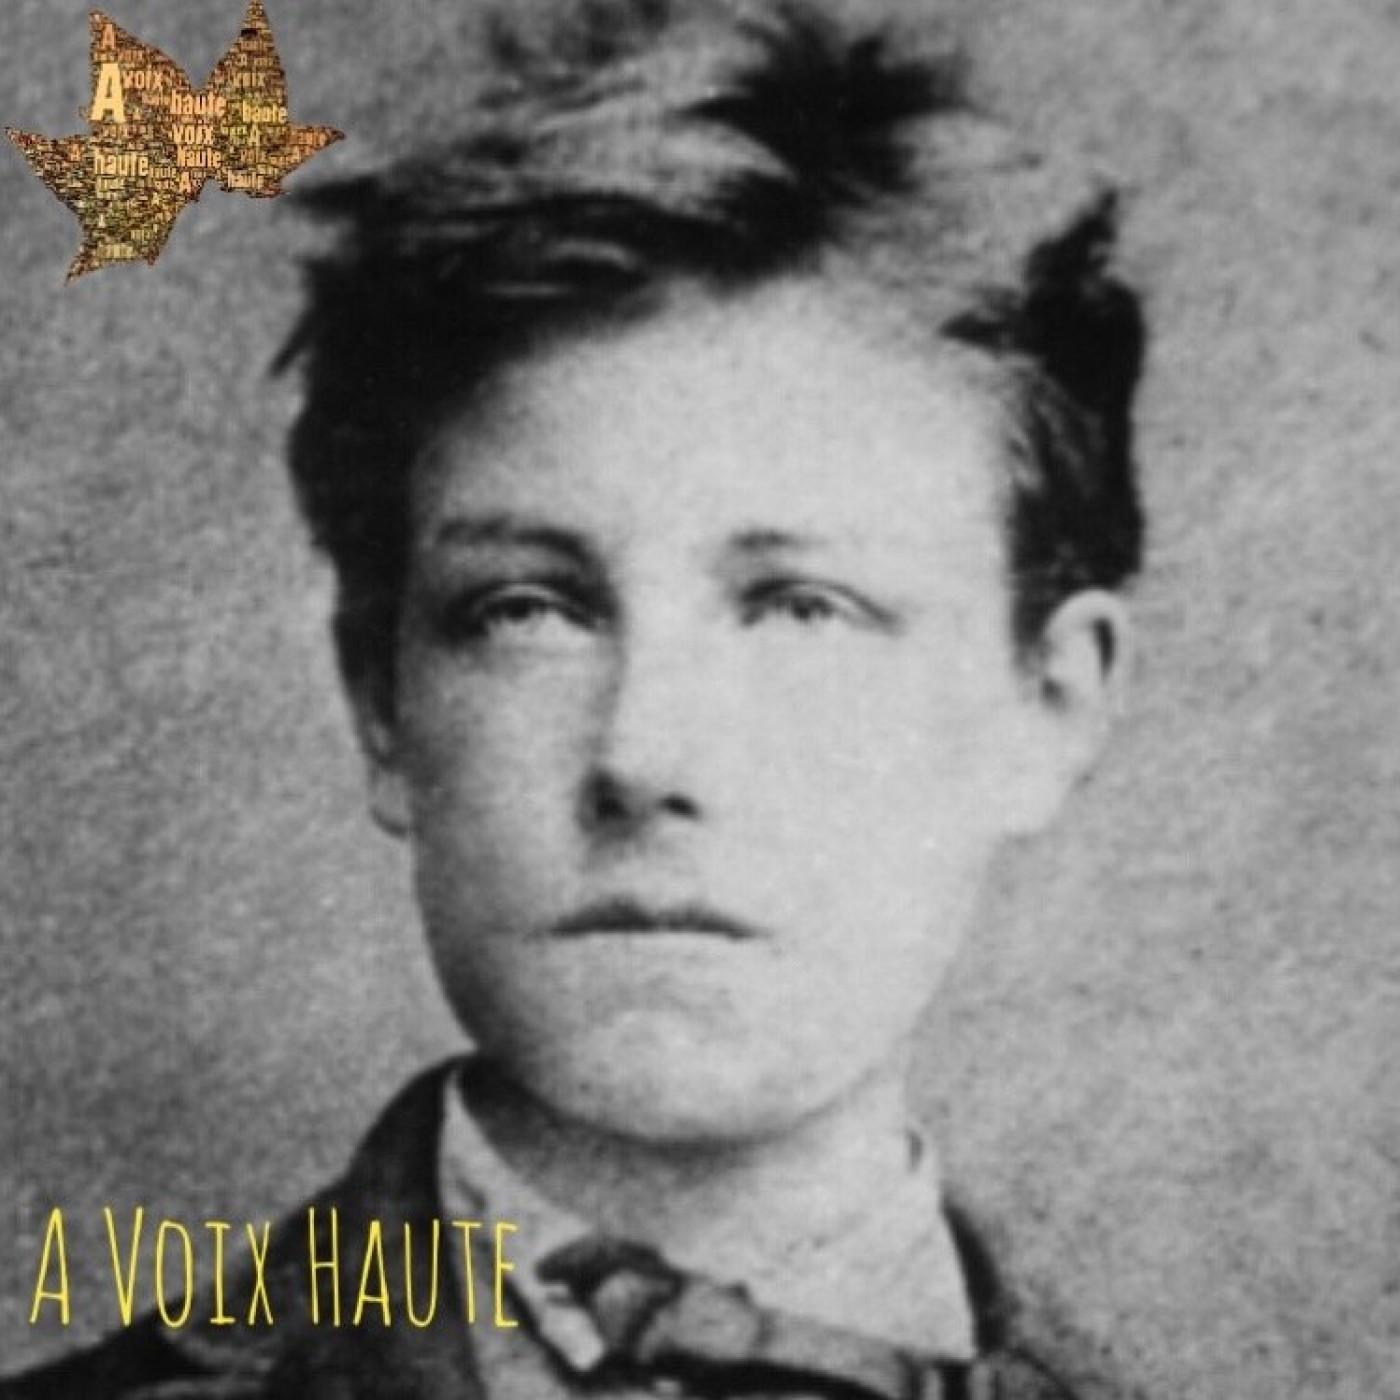 Arthur Rimbaud - Voyelles - Yannick Debain